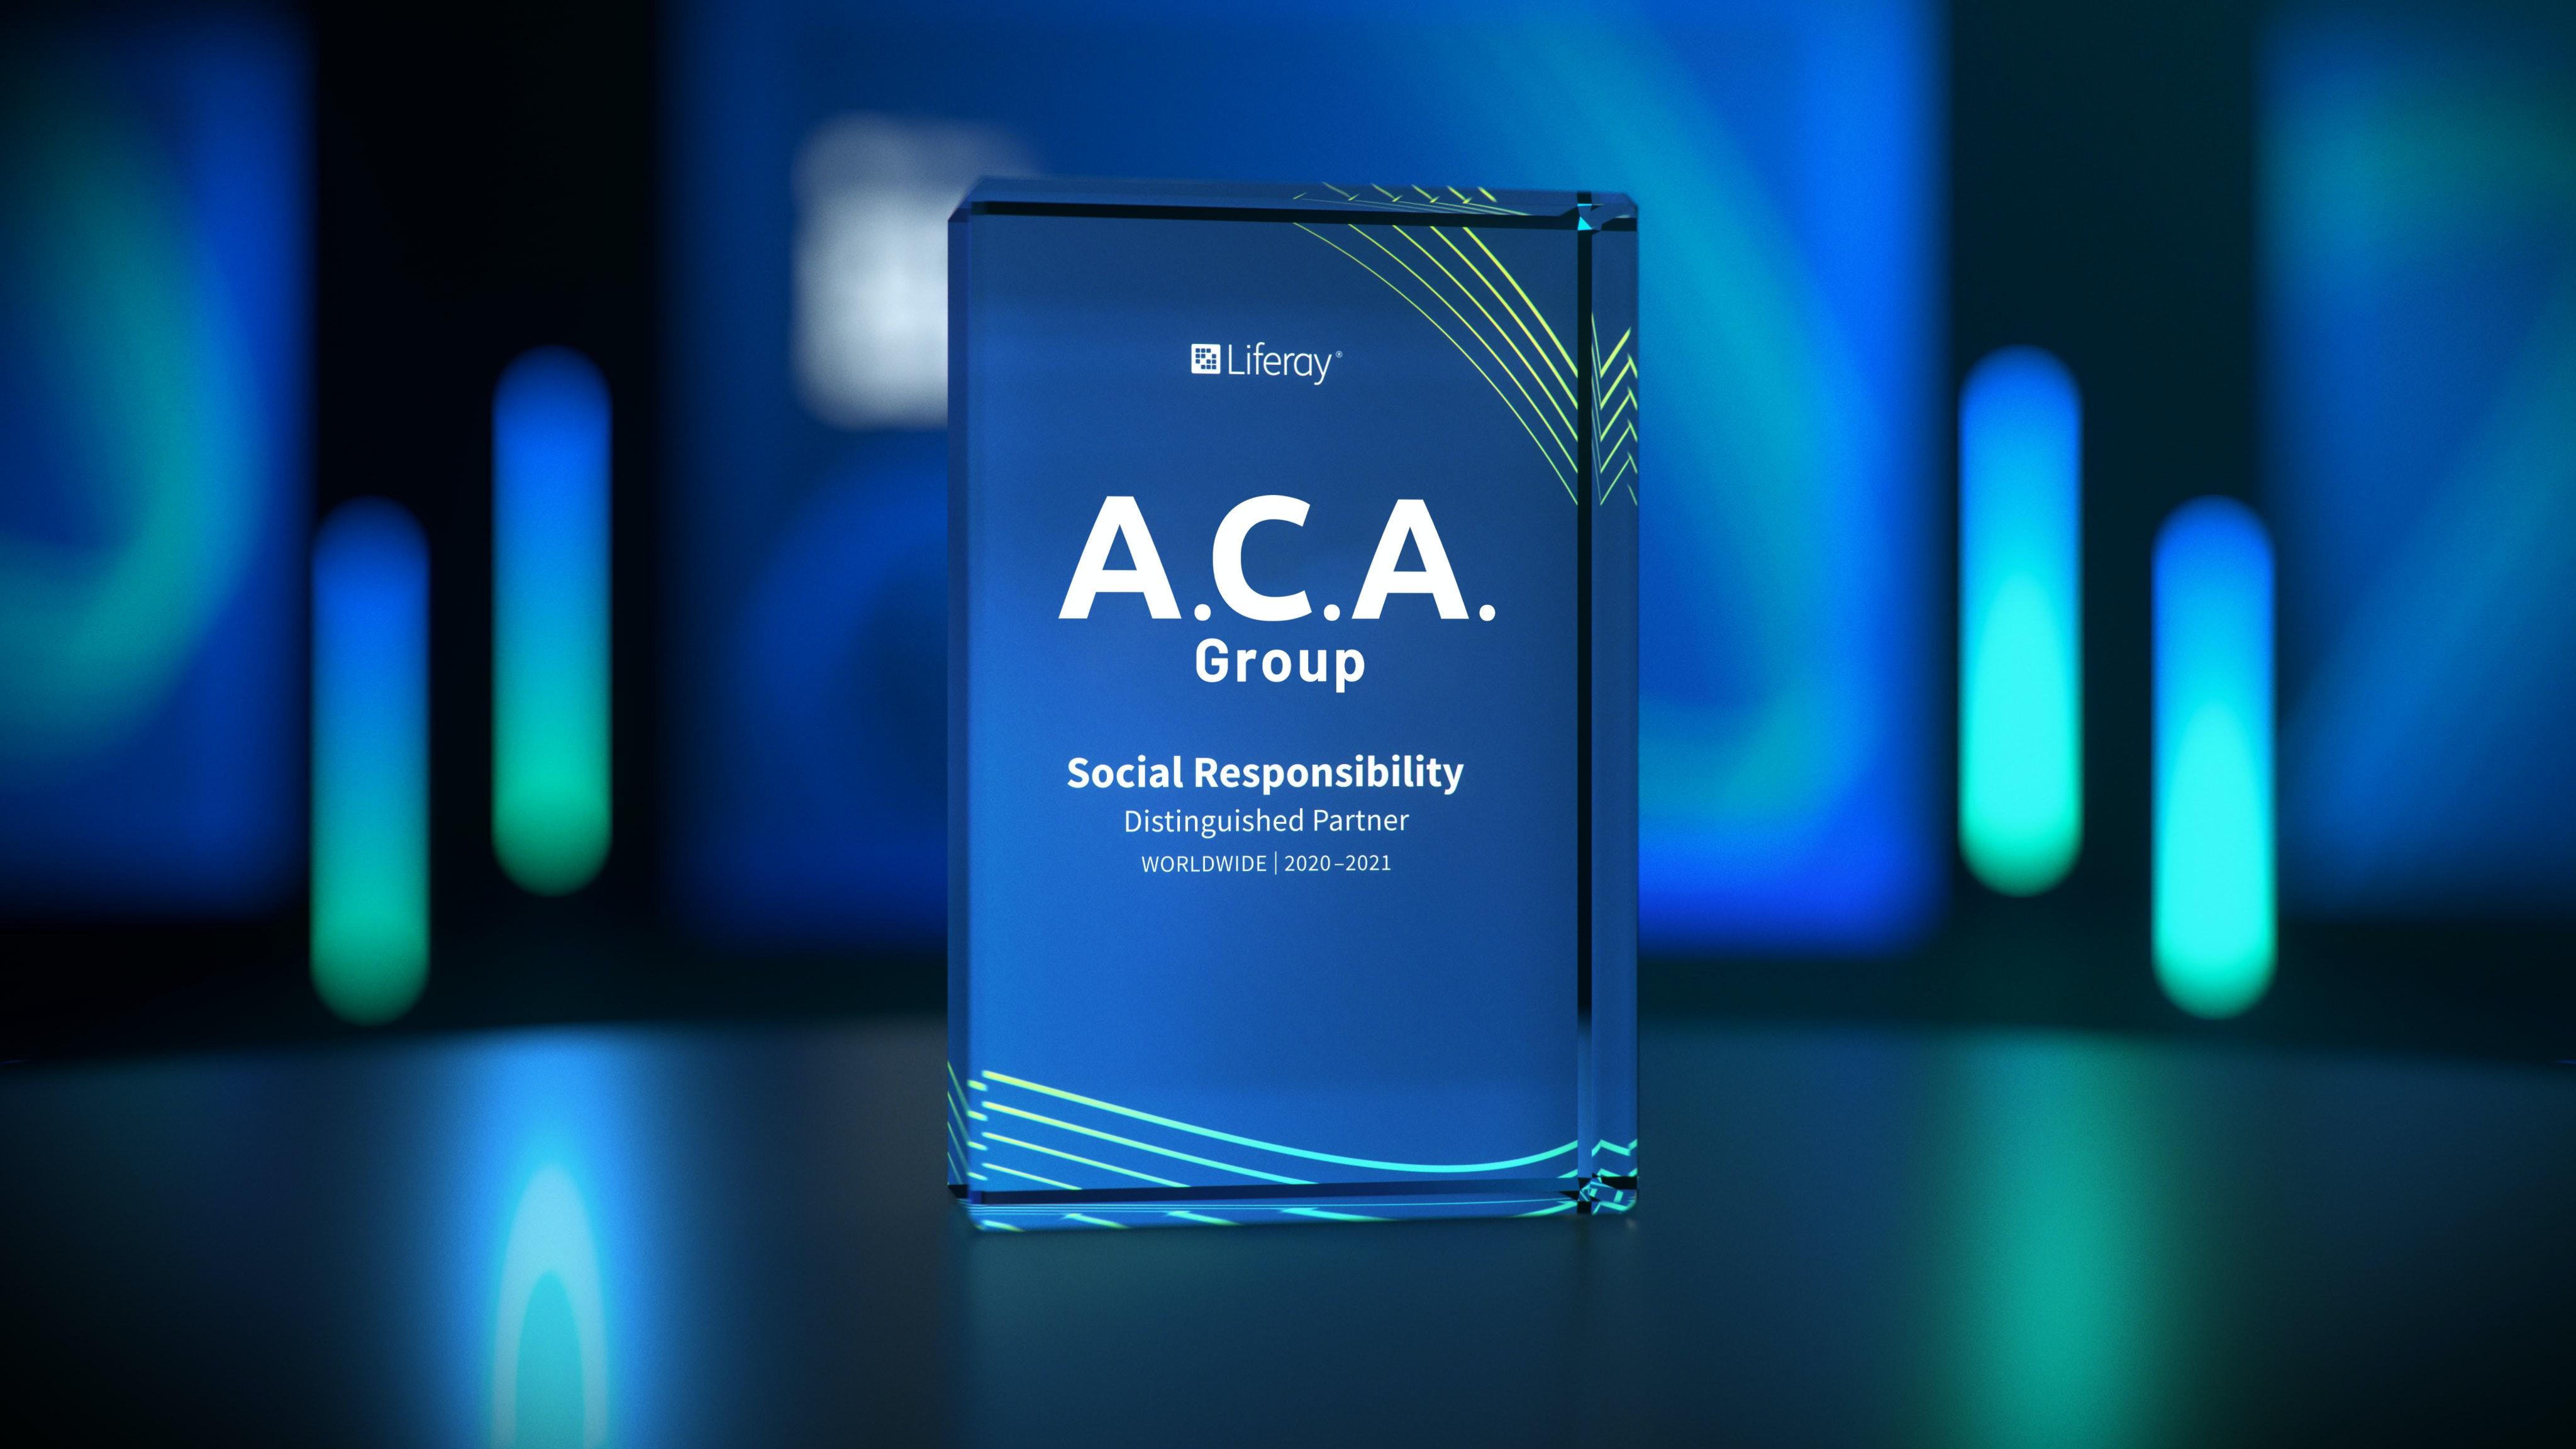 ACA Group Honored with Liferay Partner Award 2021